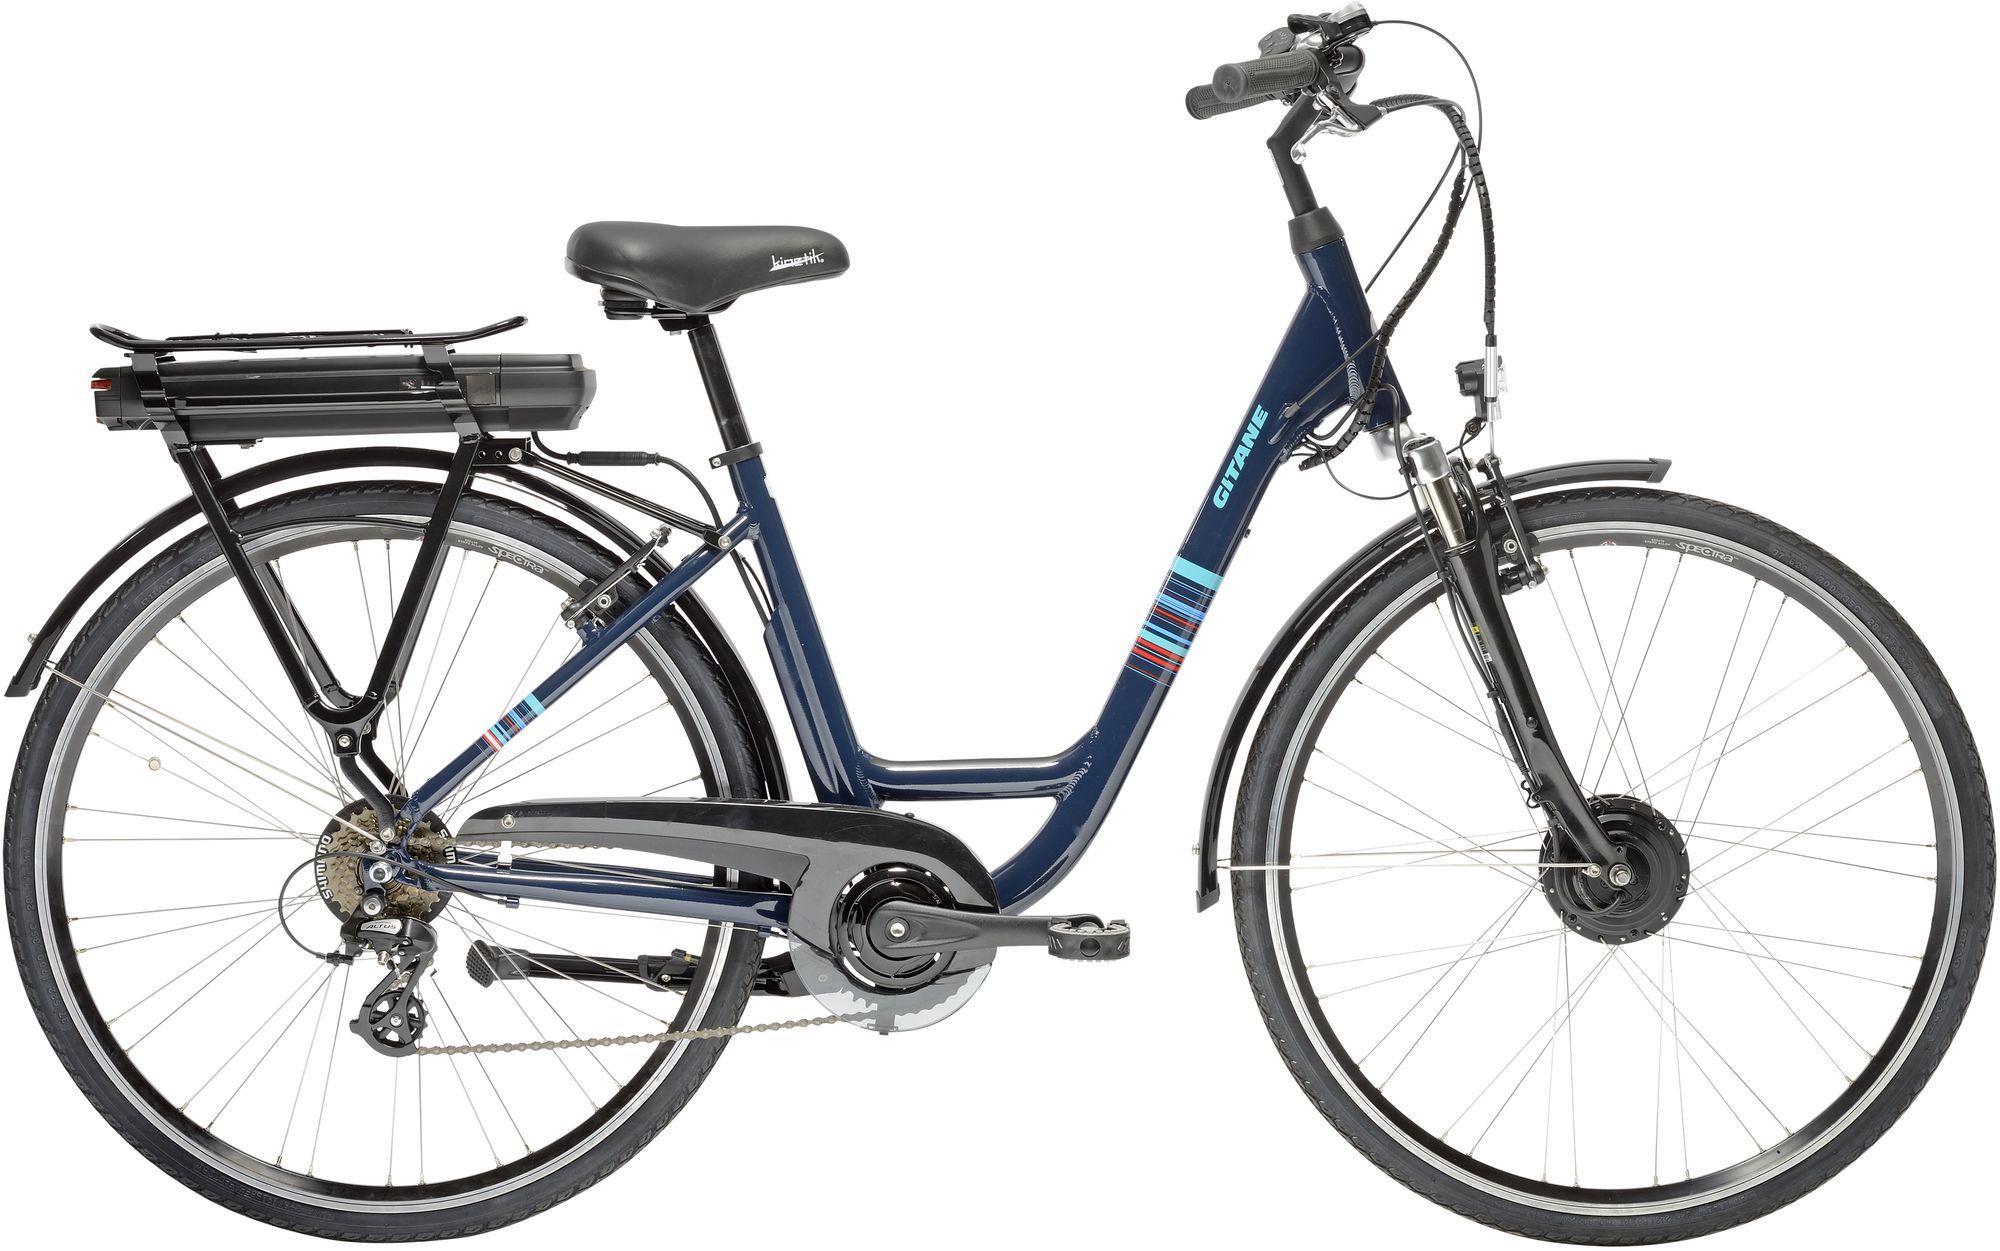 Gitane organ e bike mixte 2016 velobrival - Velo electrique avis consommateur ...